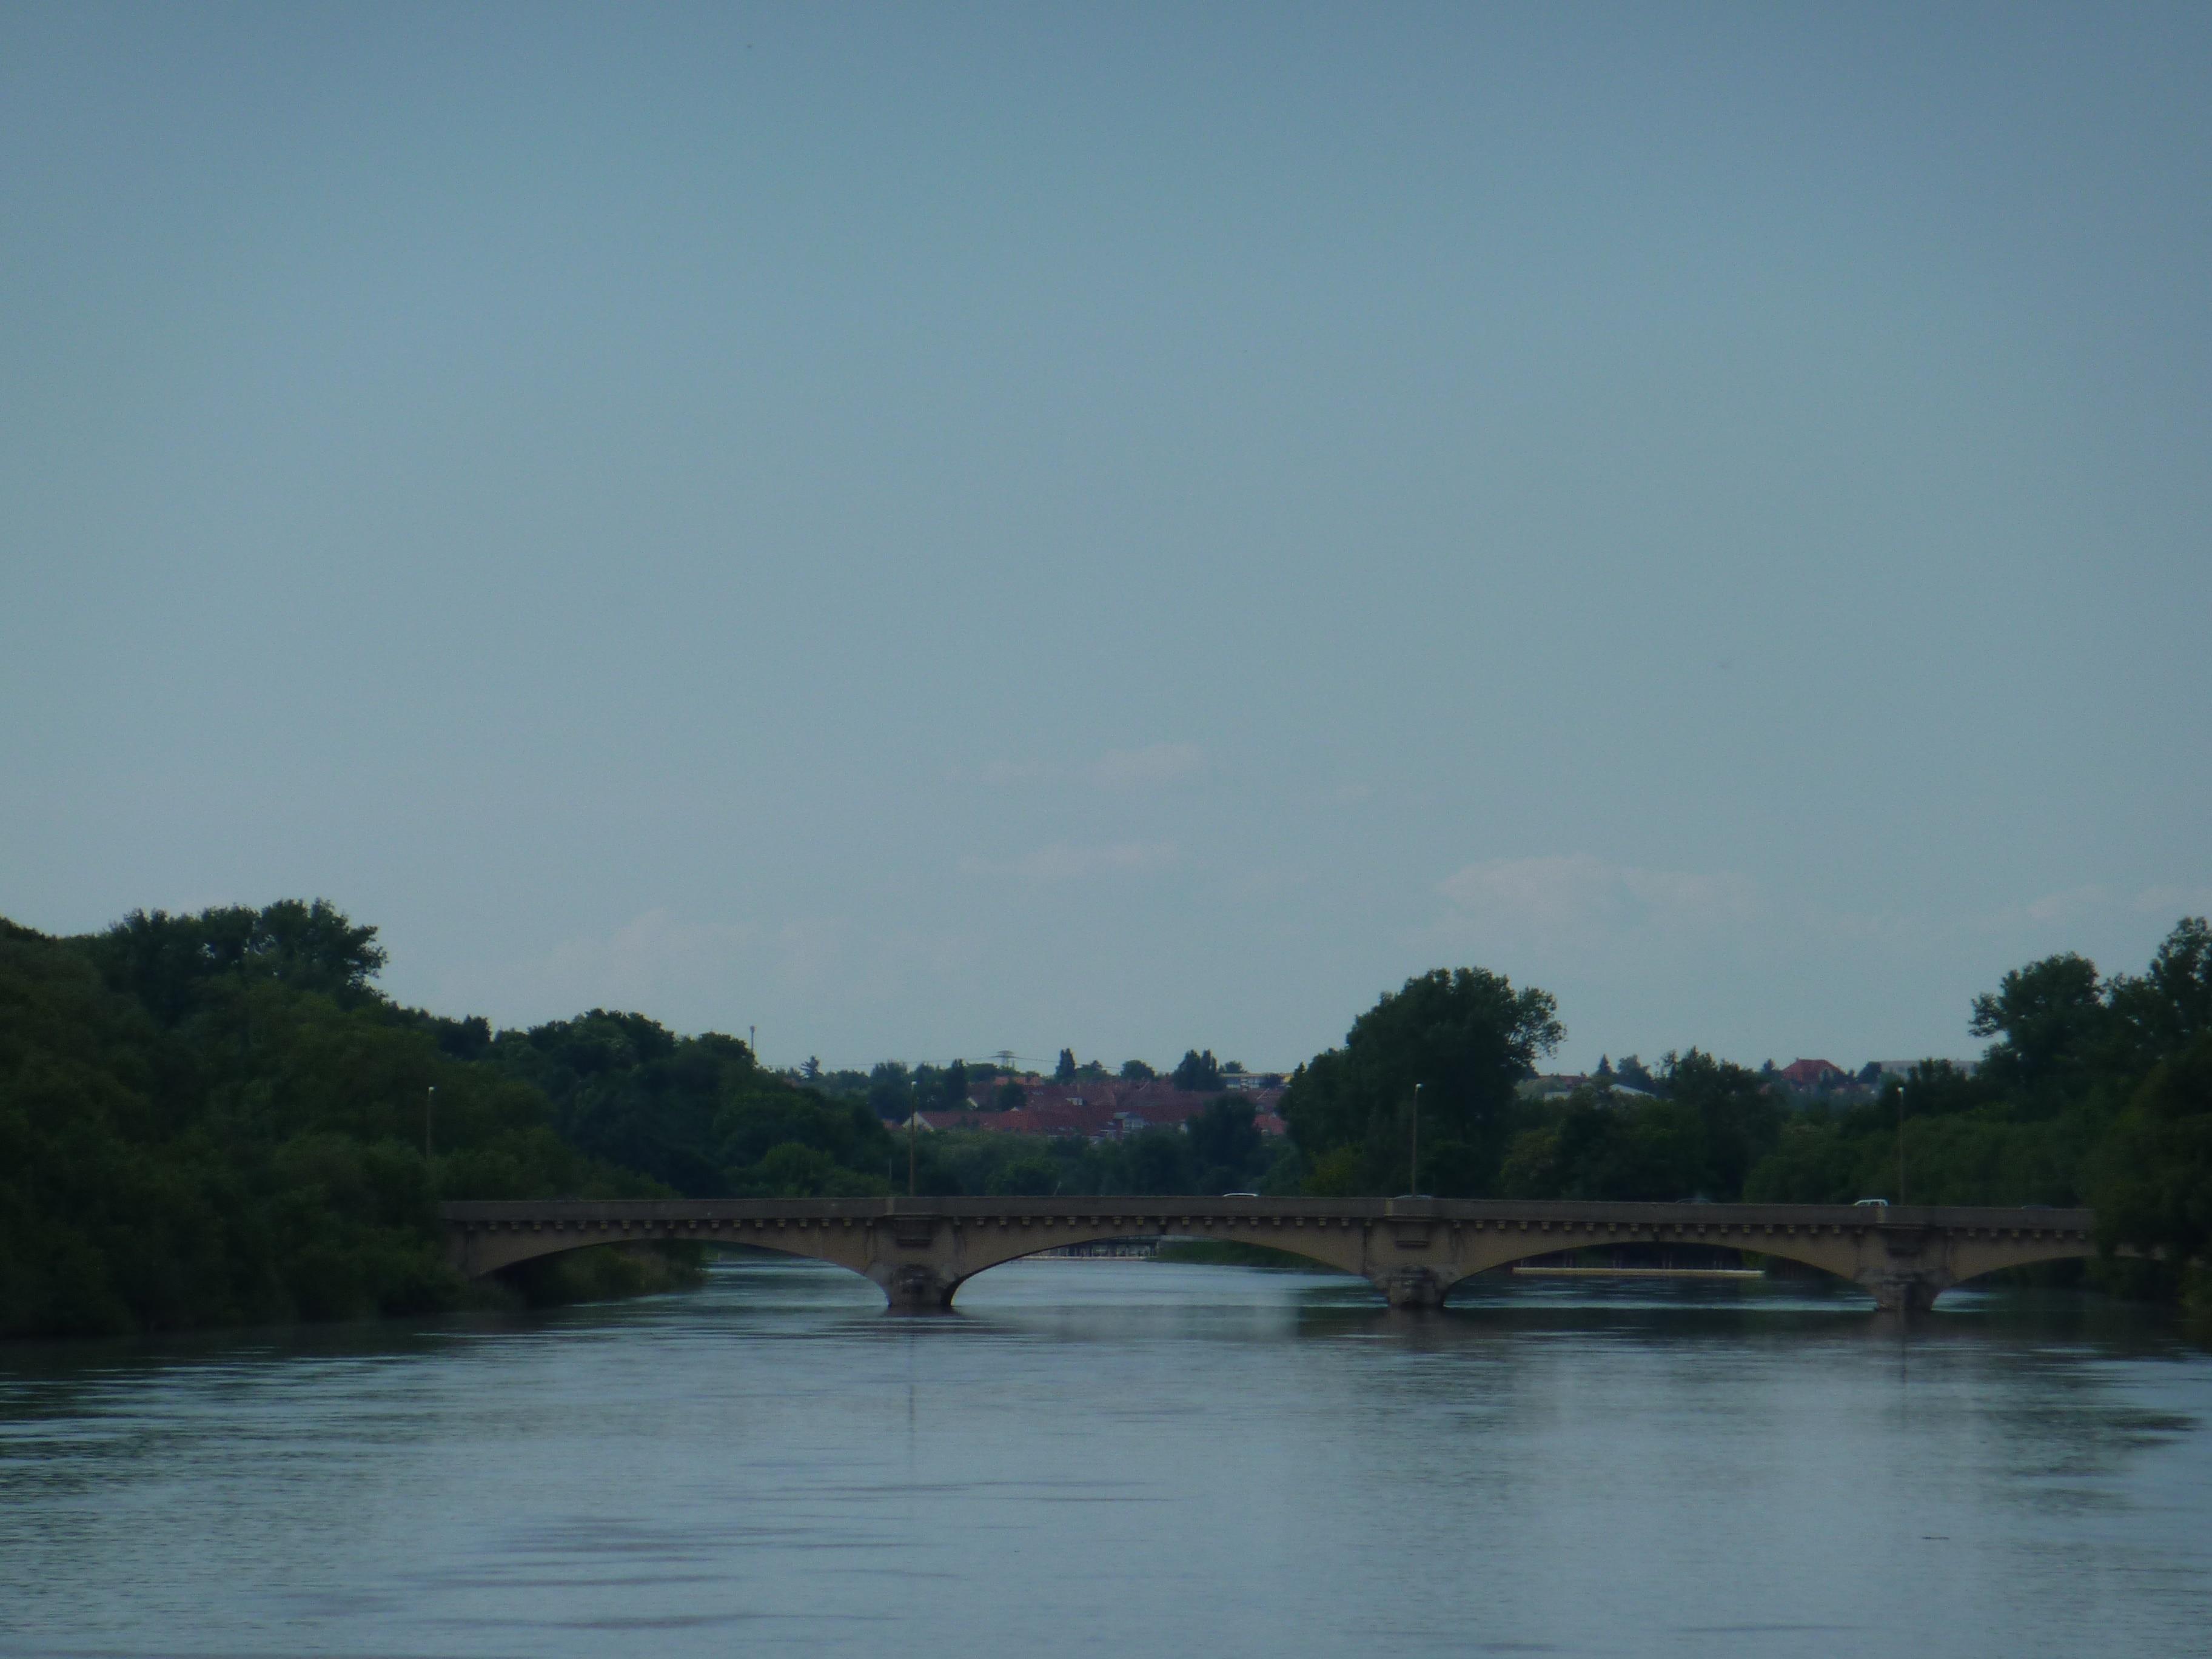 Altlindenau, Leipzig, Saxony, Germany